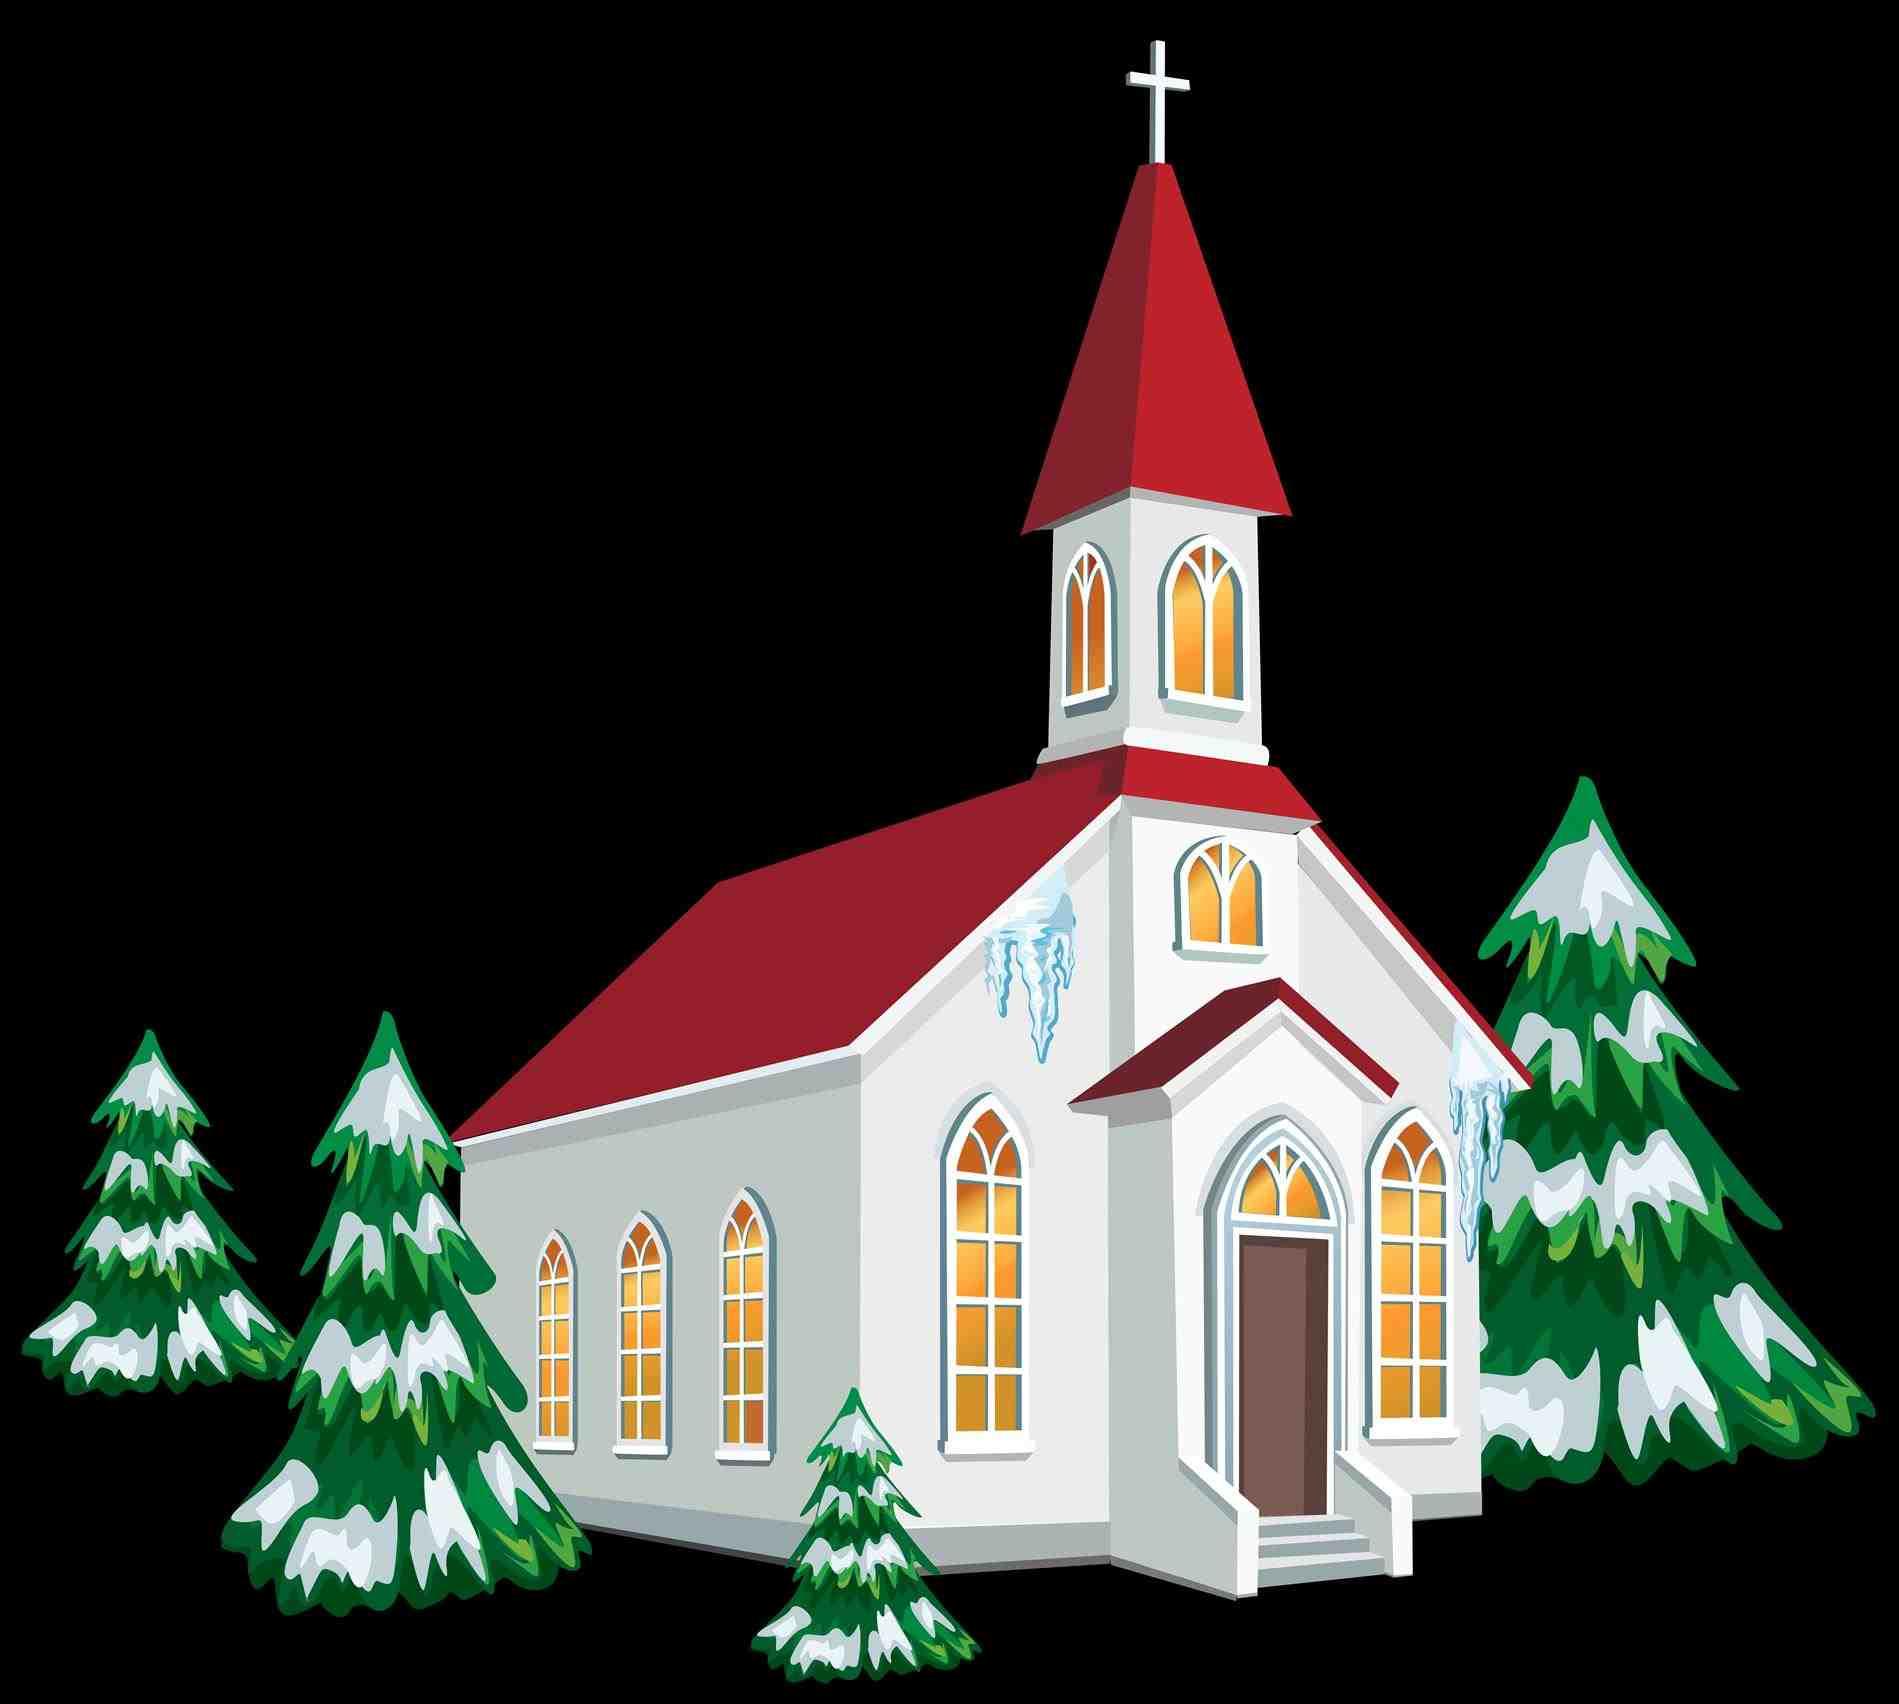 1899x1704 Religious Christmas Clip Art Free Cheminee.website